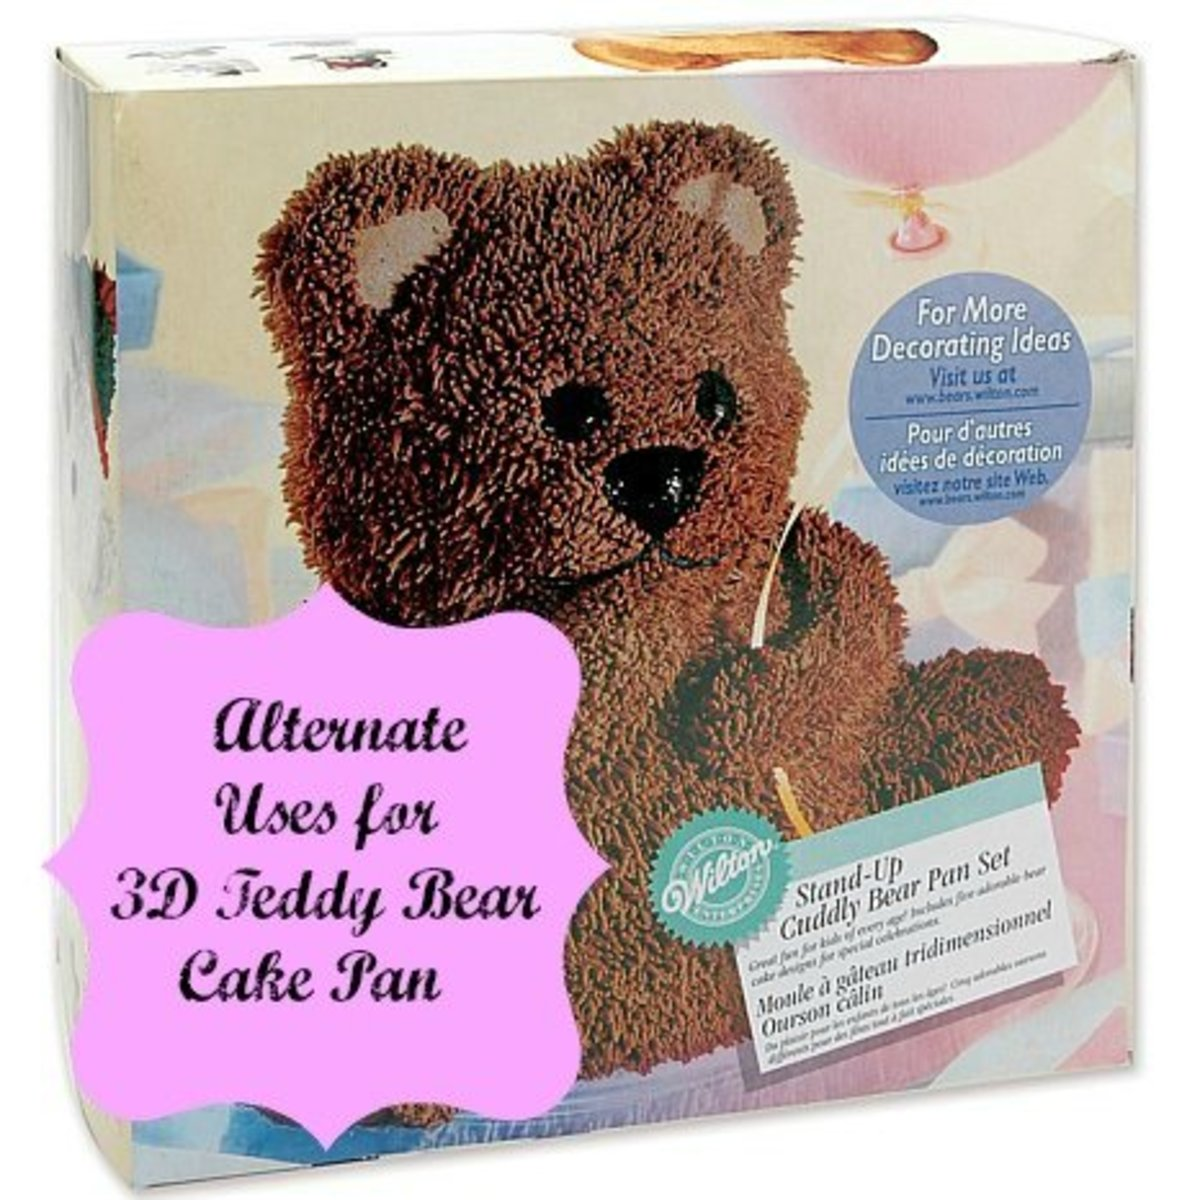 Alternate Uses For 3D Cuddly Bear Cake Pan